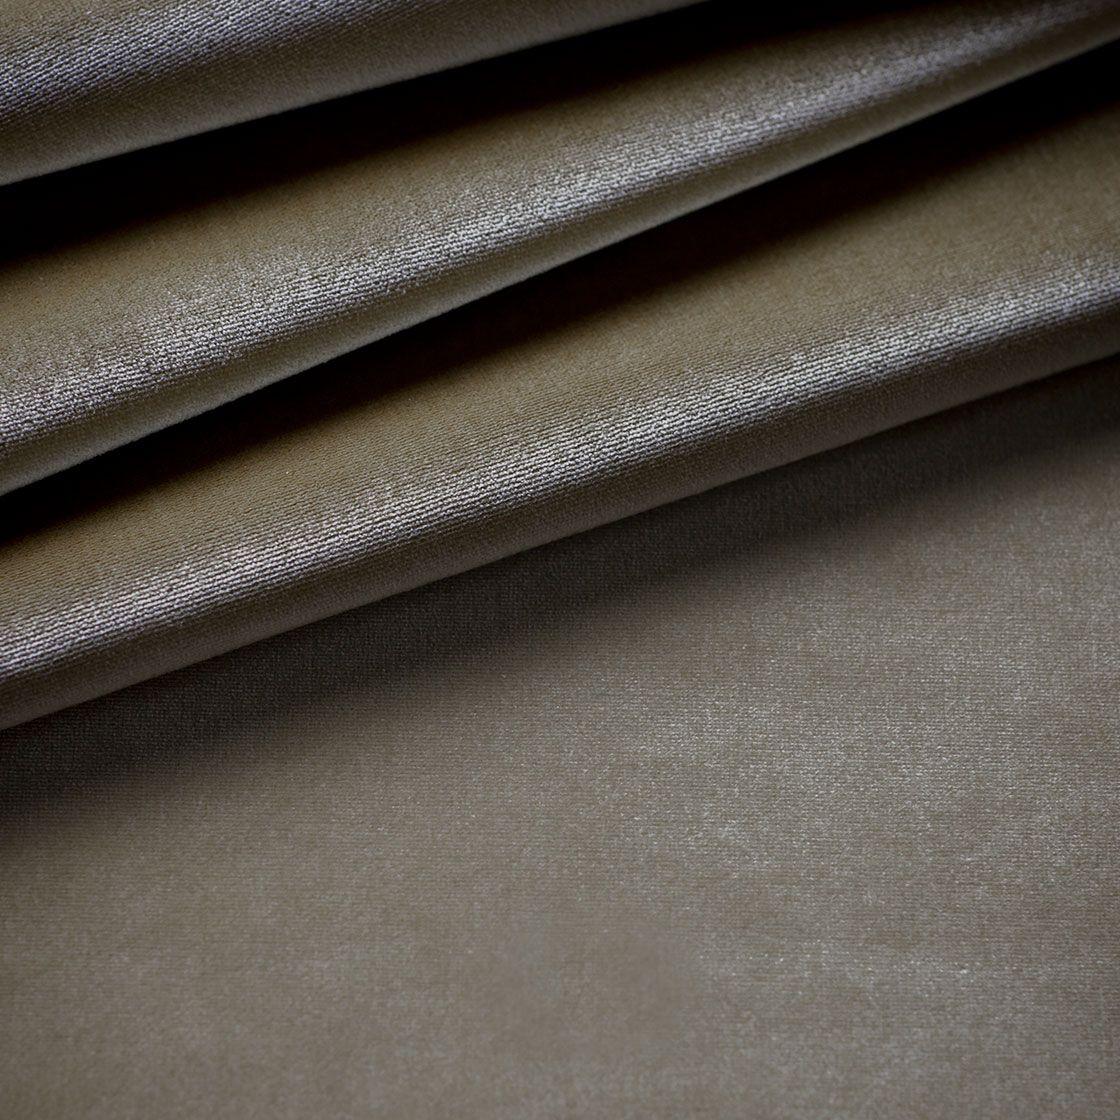 Capri Silk Velvet - French Grey - Beaumont & Fletcher - Beaumont & Fletcher